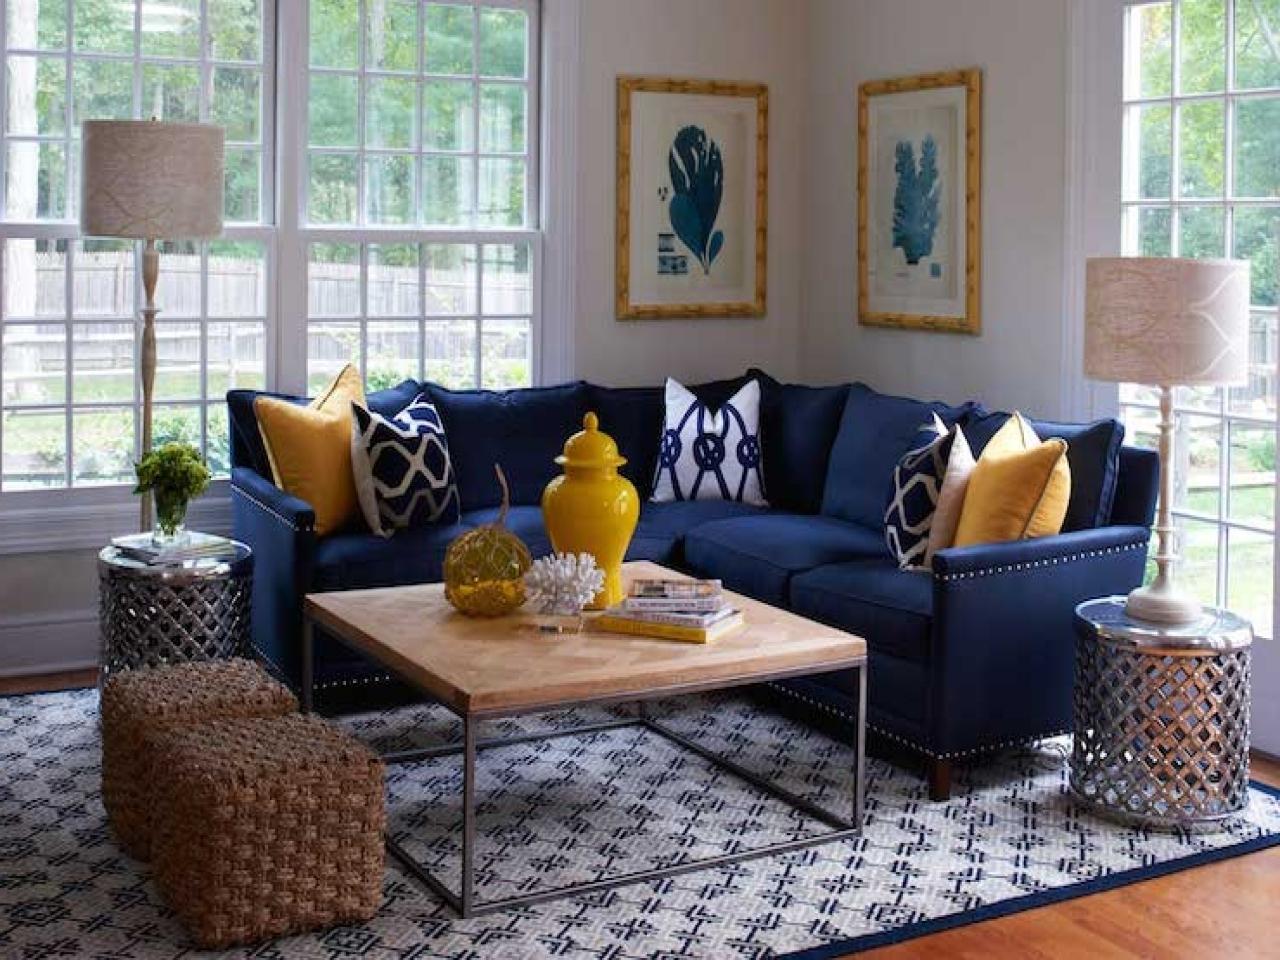 2018 Fancy Dark Blue Sofa 46 In Sofa Table Ideas With Dark Blue Sofa For Dark Blue Sofas (View 3 of 15)